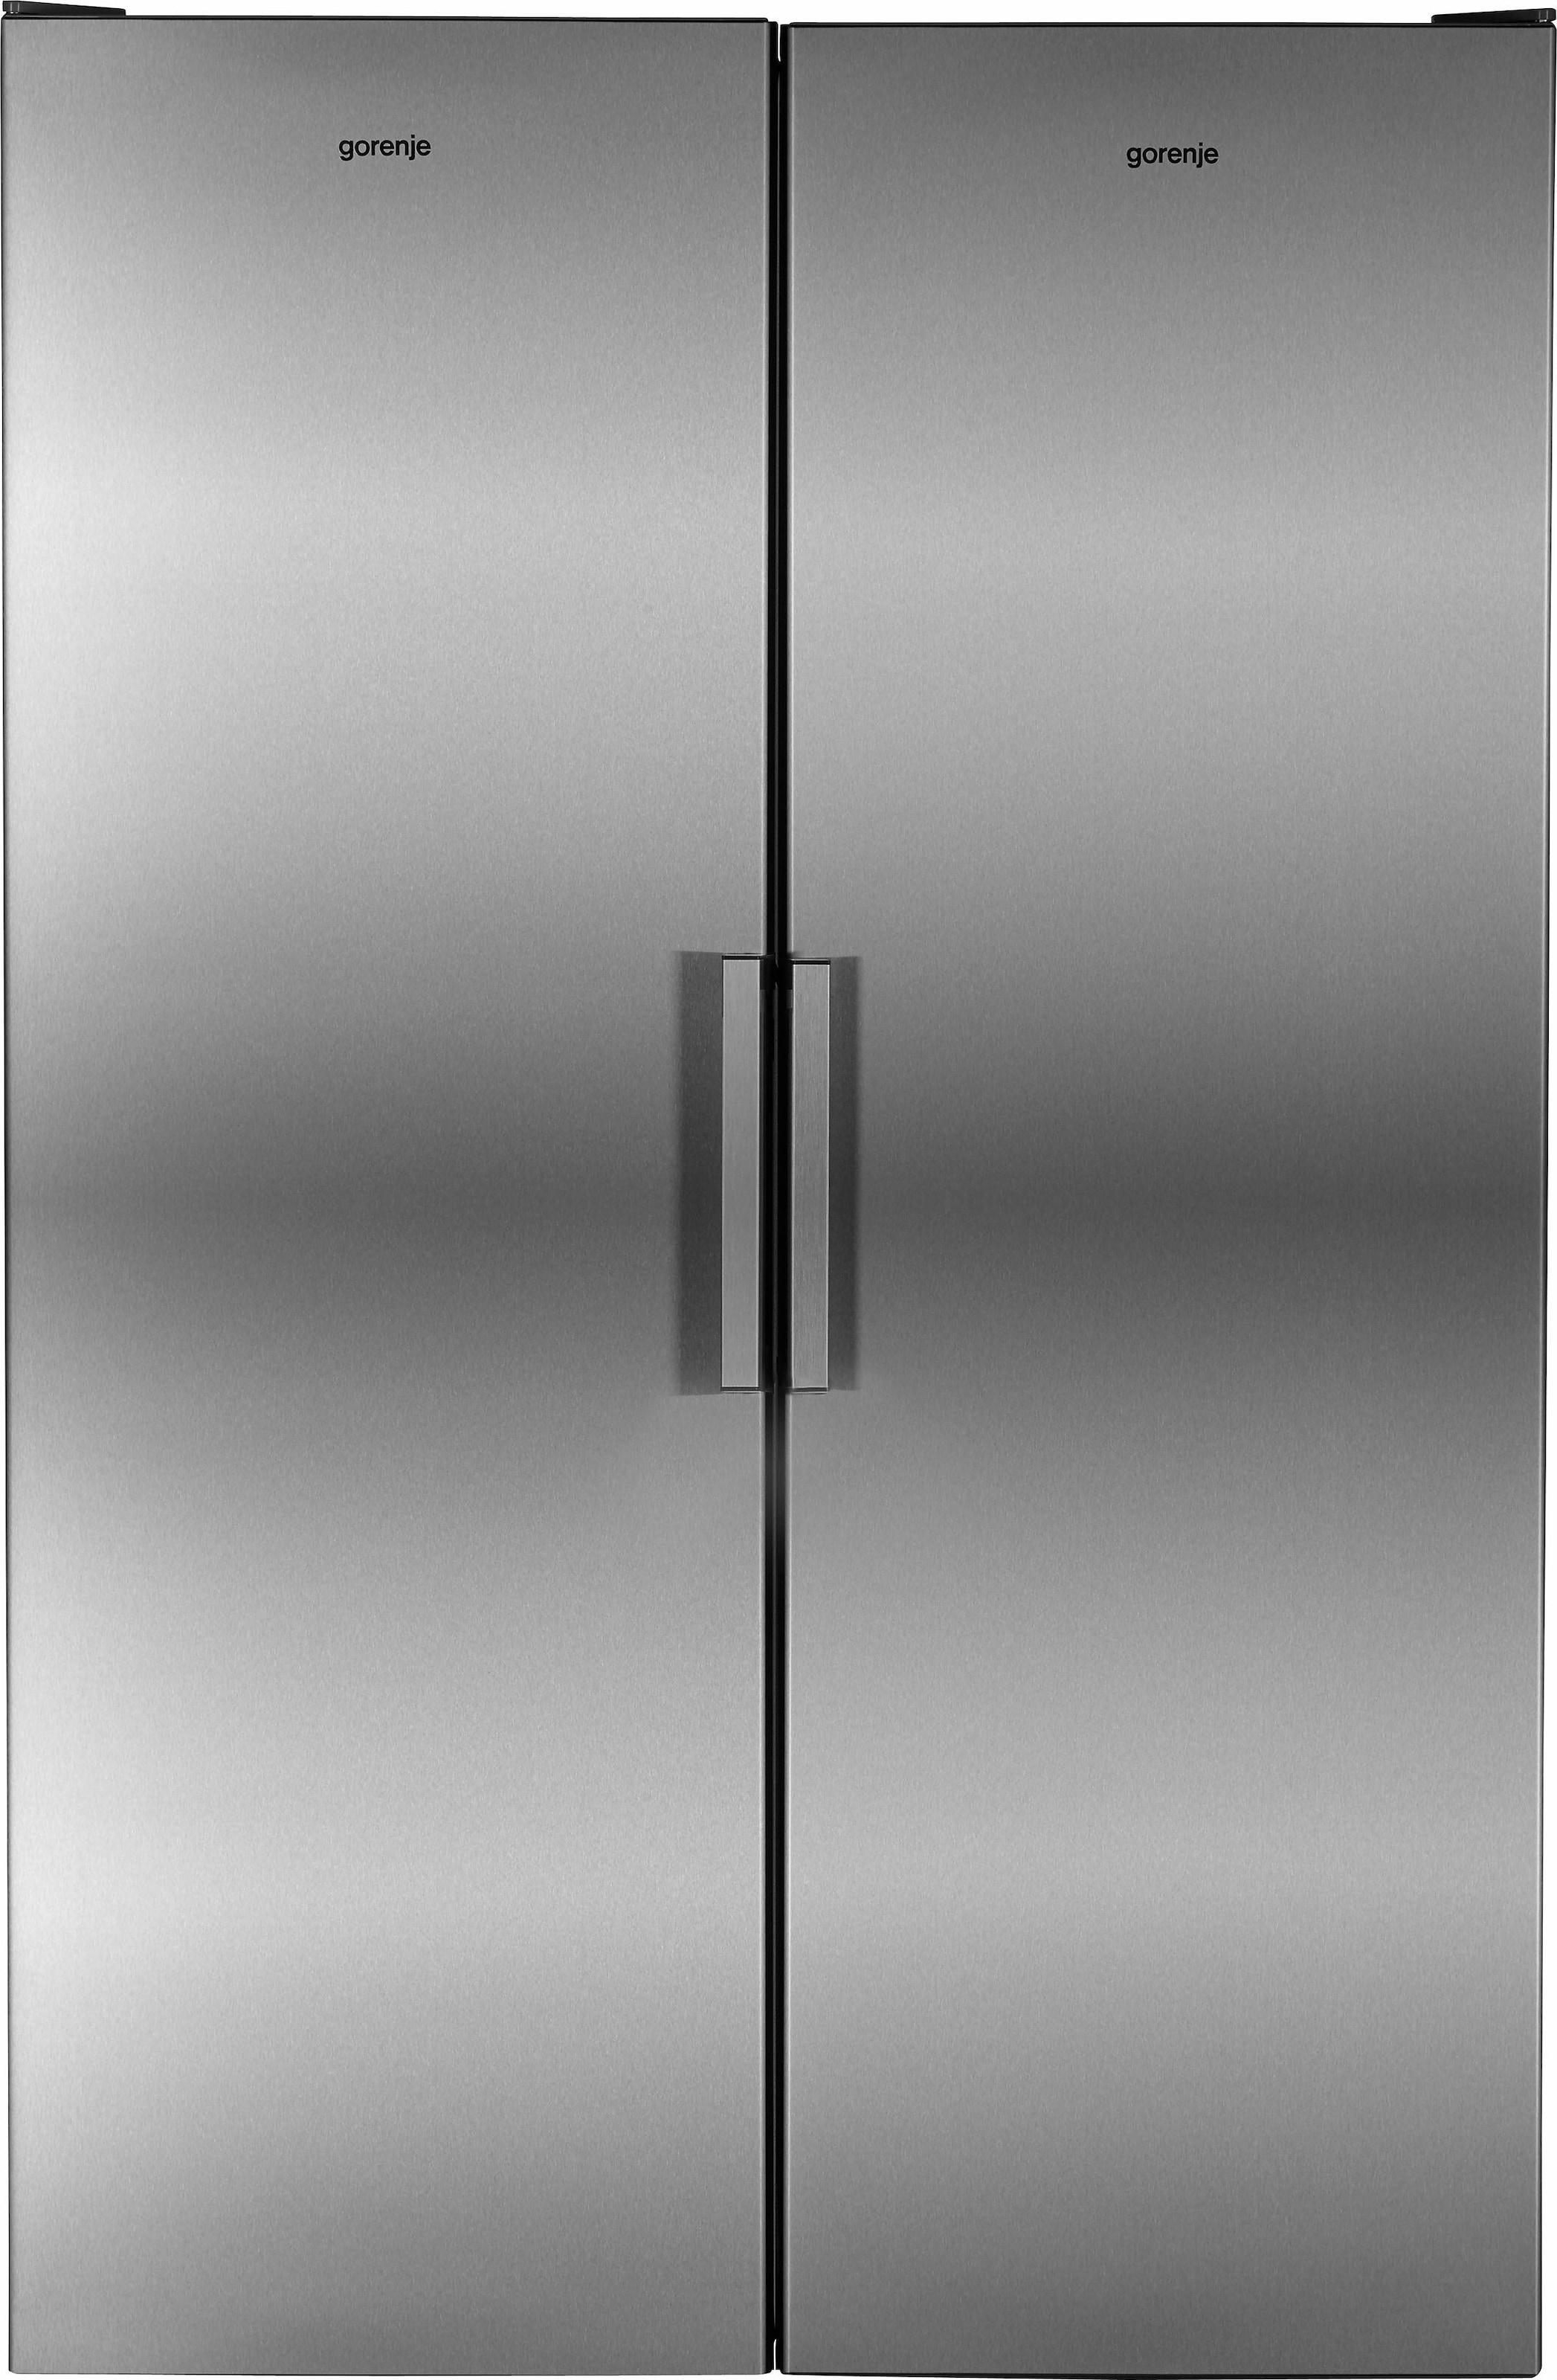 Side By Side Kühlschrank Extra Schmal : Side by side kühlschrank cm breit kühlschrank modelle